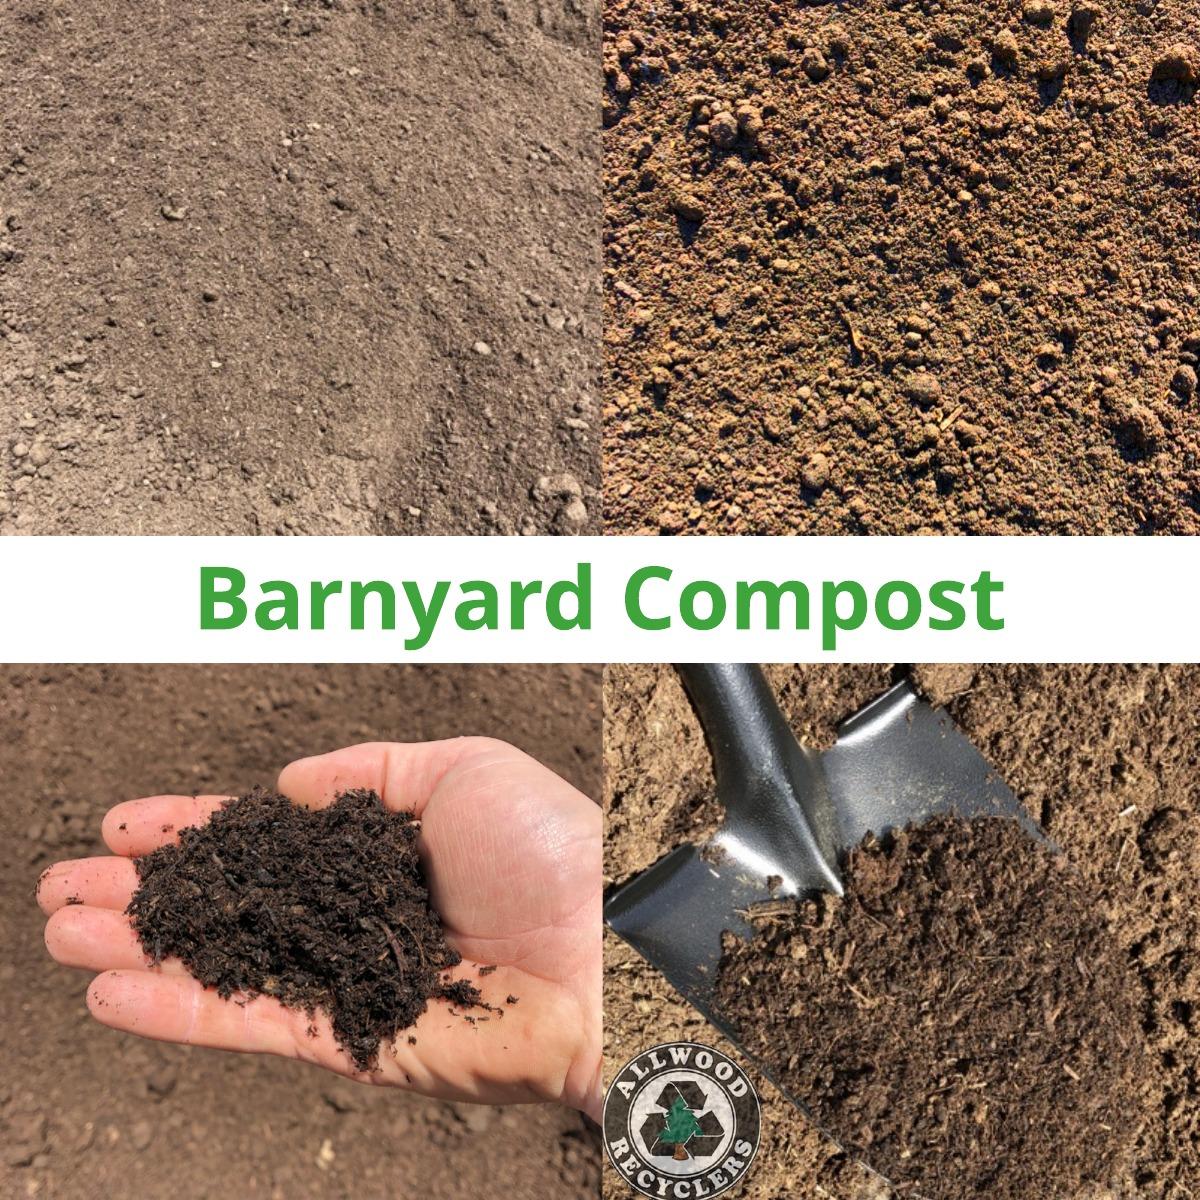 Barnyard Compost